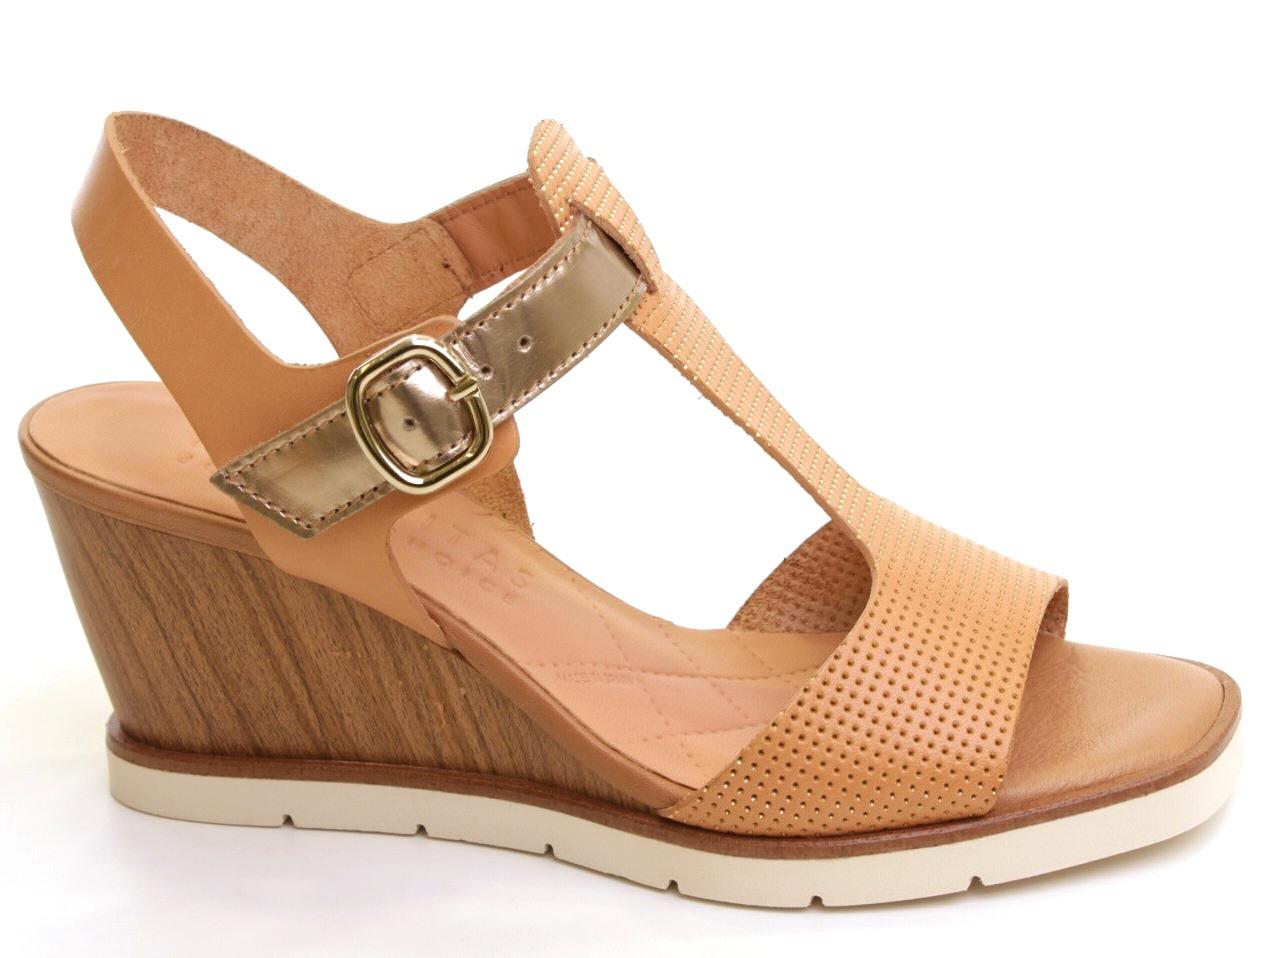 Wedge Sandals Hispanitas - 165 CHV62856